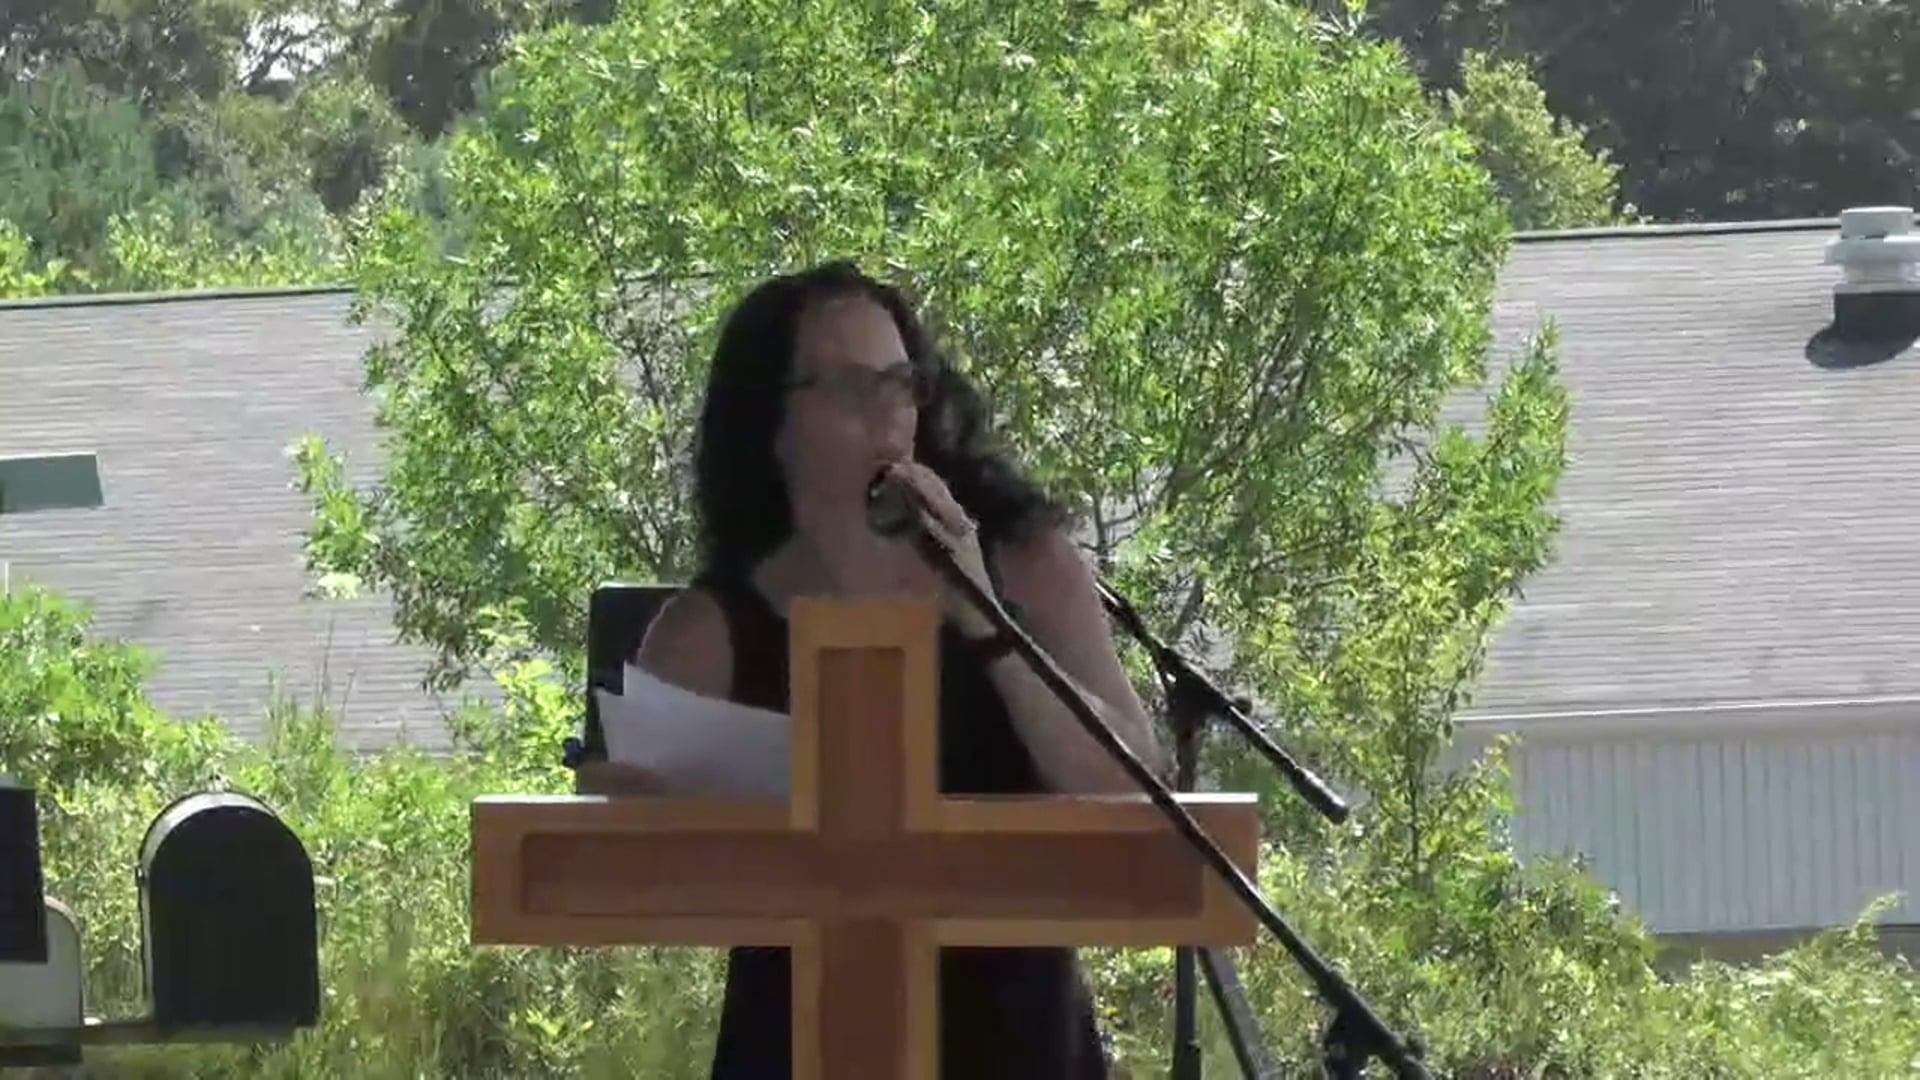 Shannon's Testimony